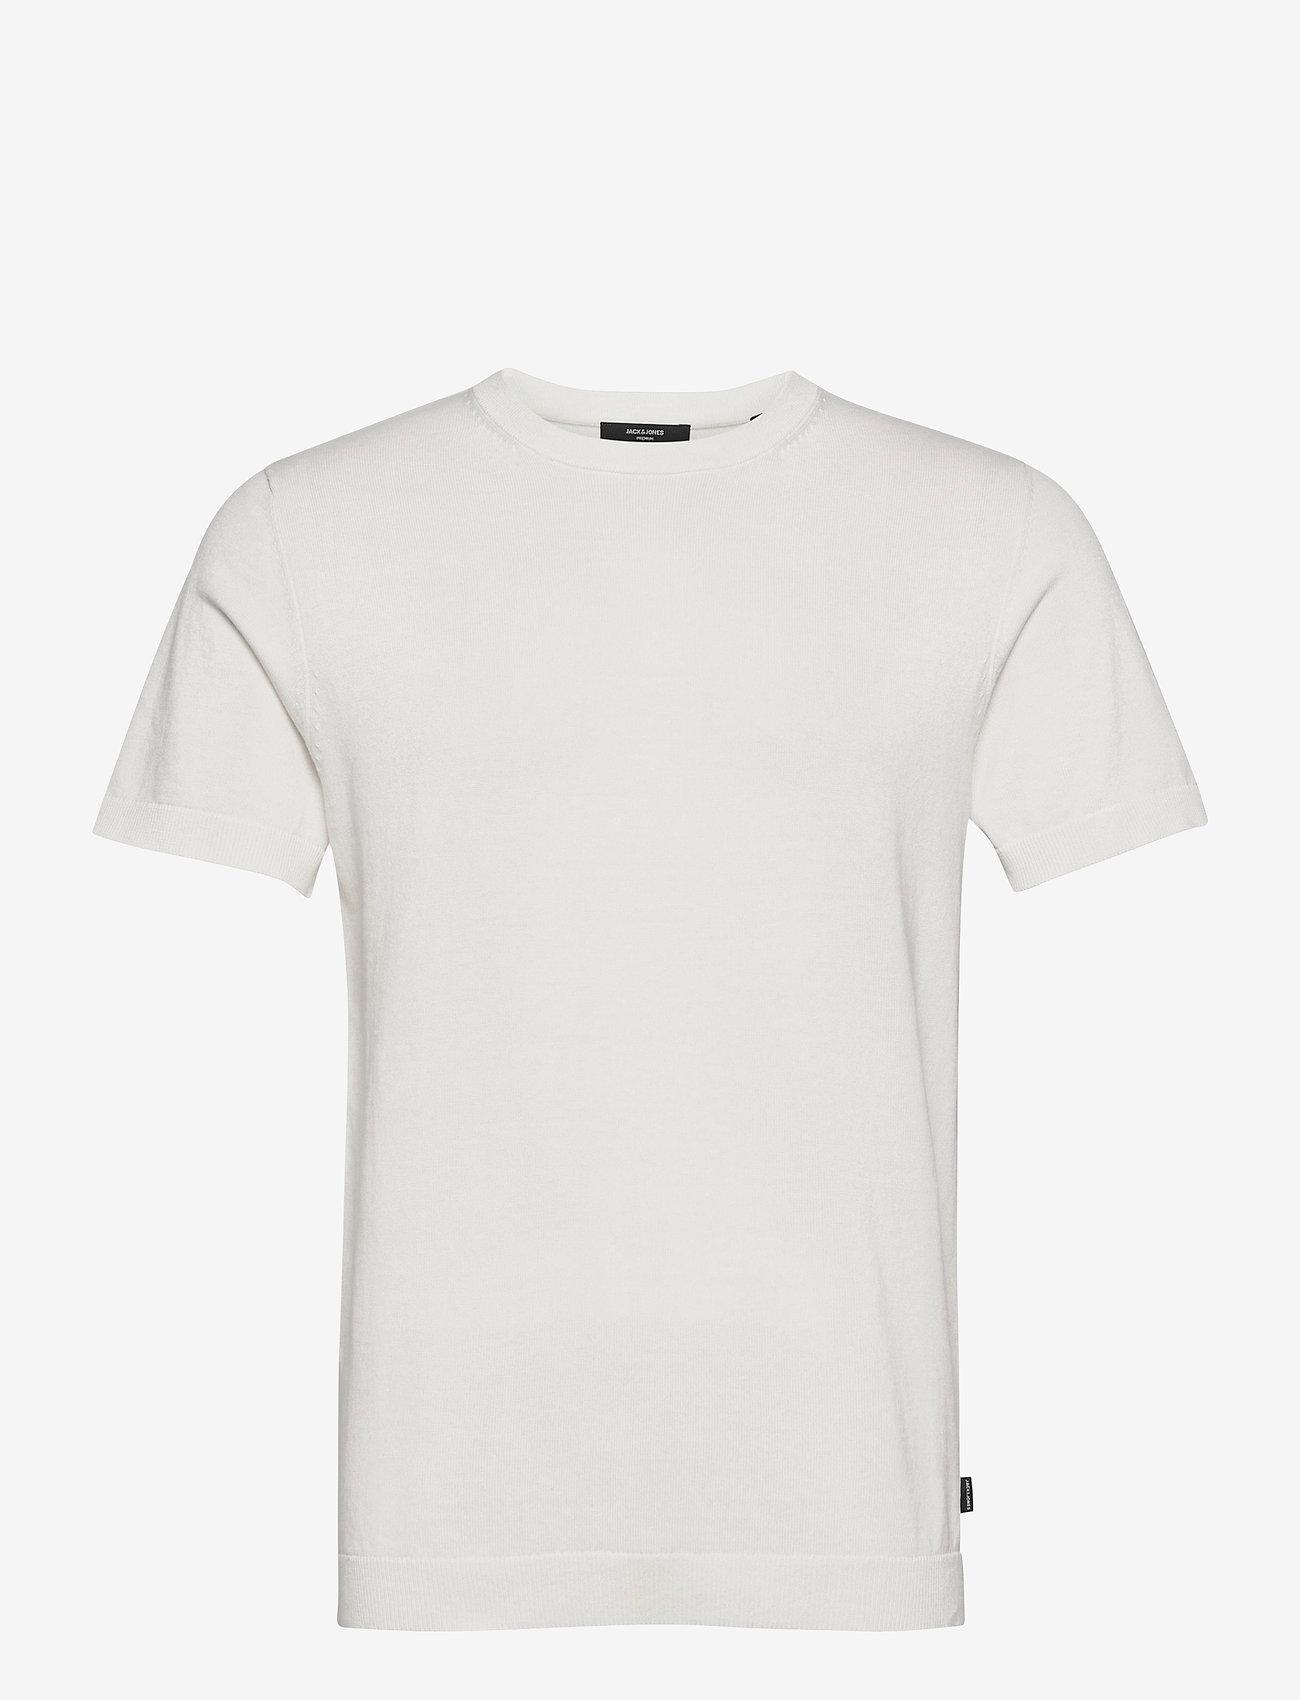 Jack & Jones - JPRBLAIGOR KNIT SS - basic t-shirts - egret - 0